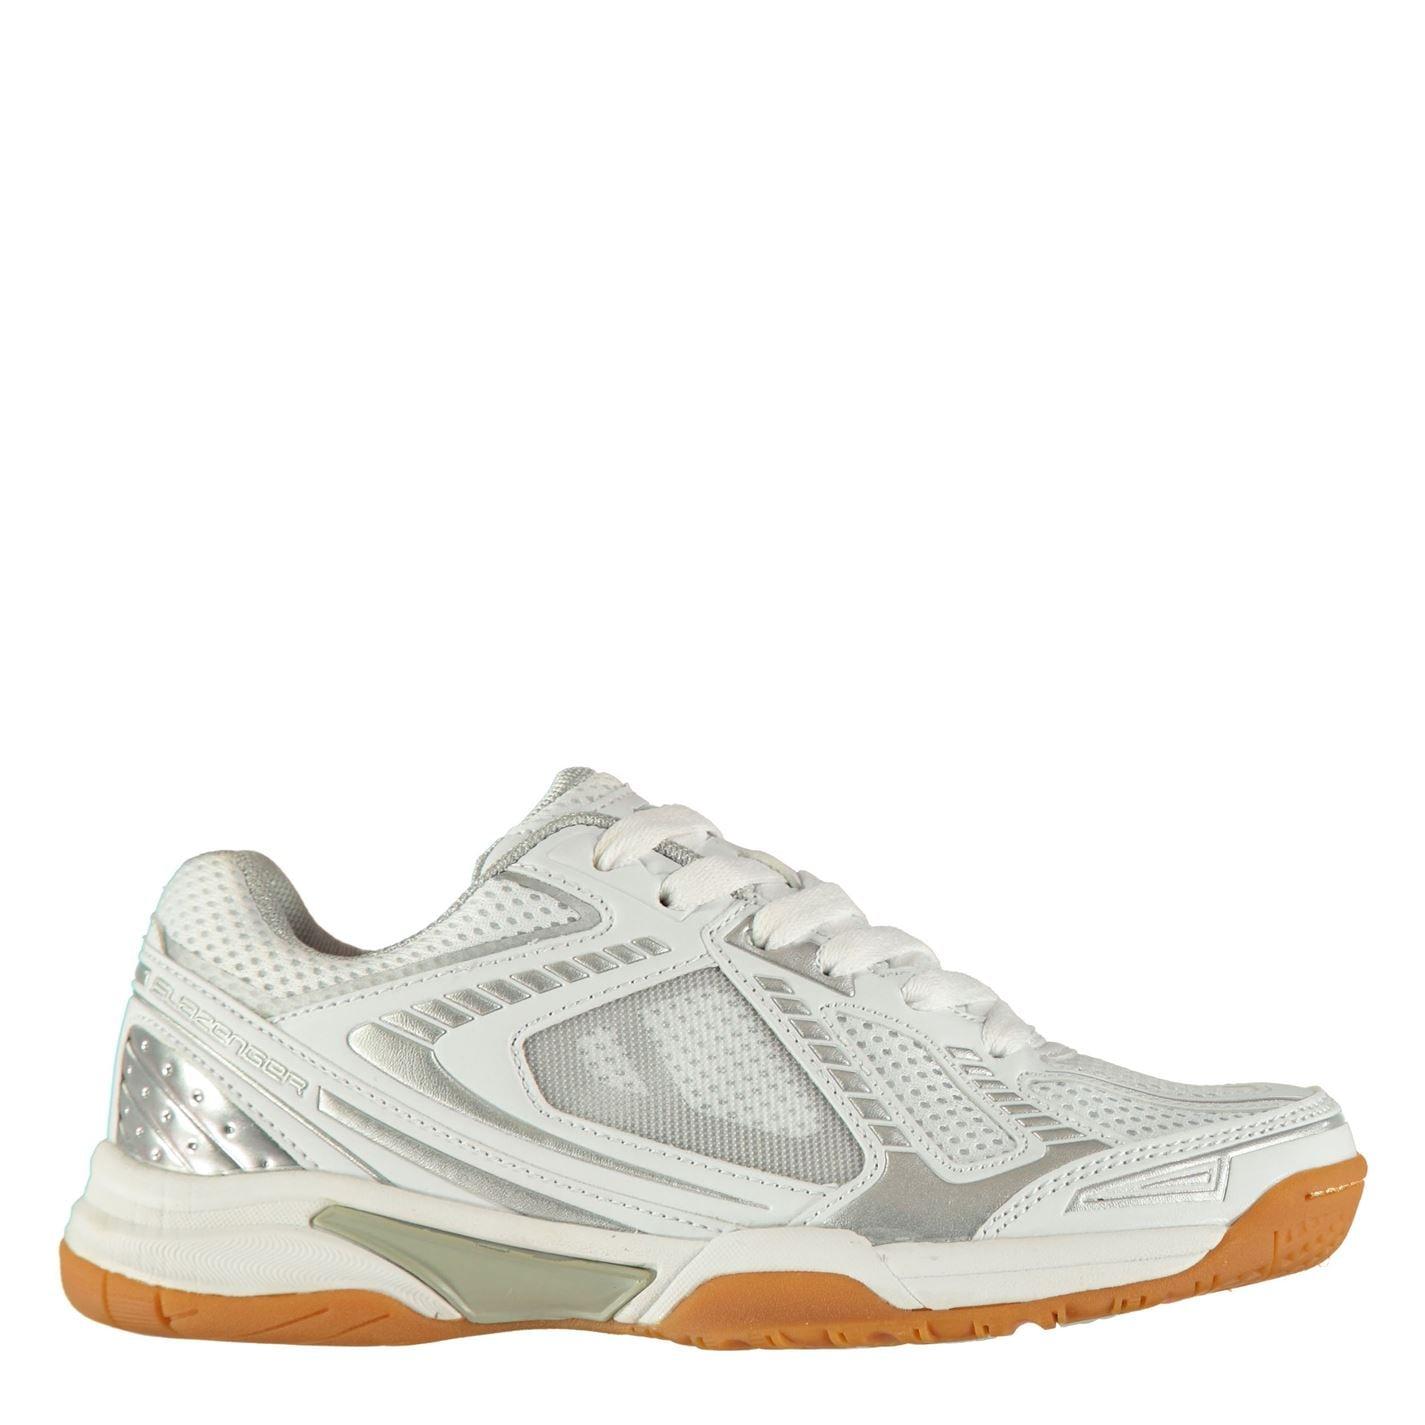 Slazenger Indoor Shoes Ladies White/Silver